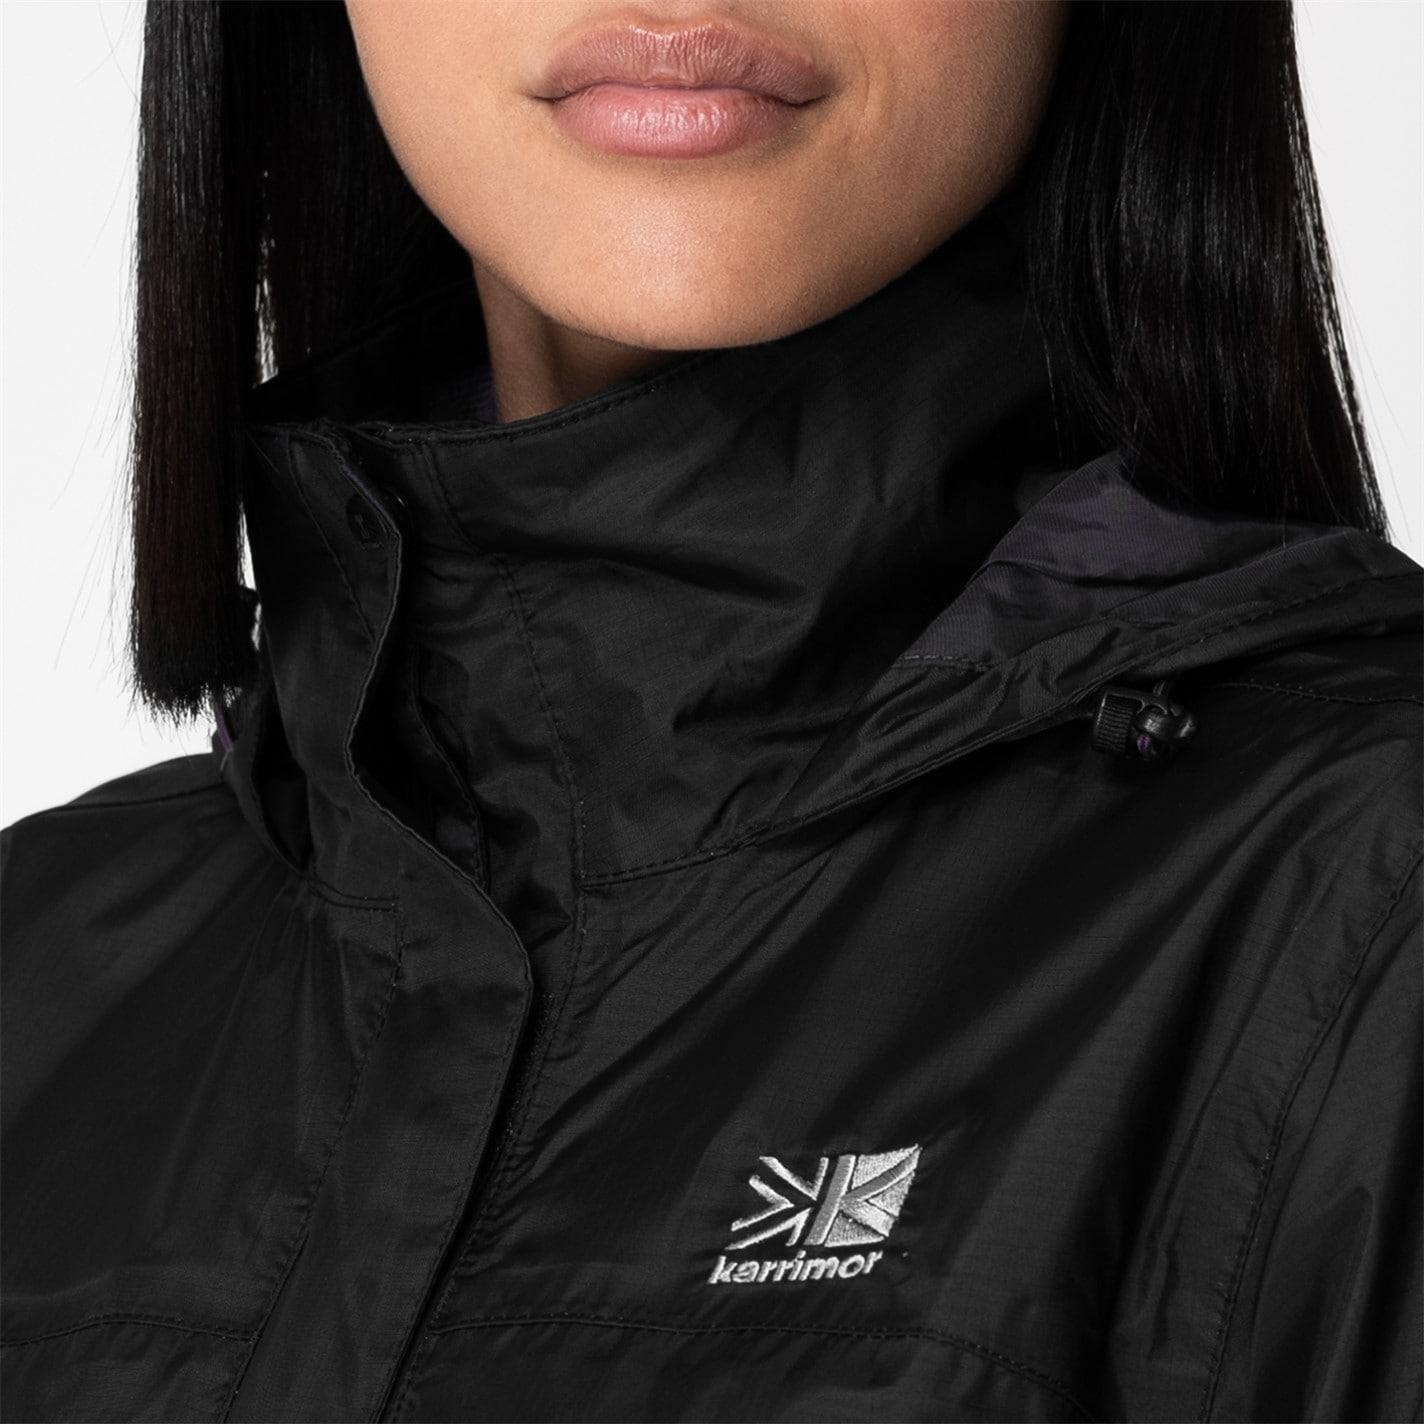 Jacheta Karrimor Sierra Weathertite pentru Femei negru r mov